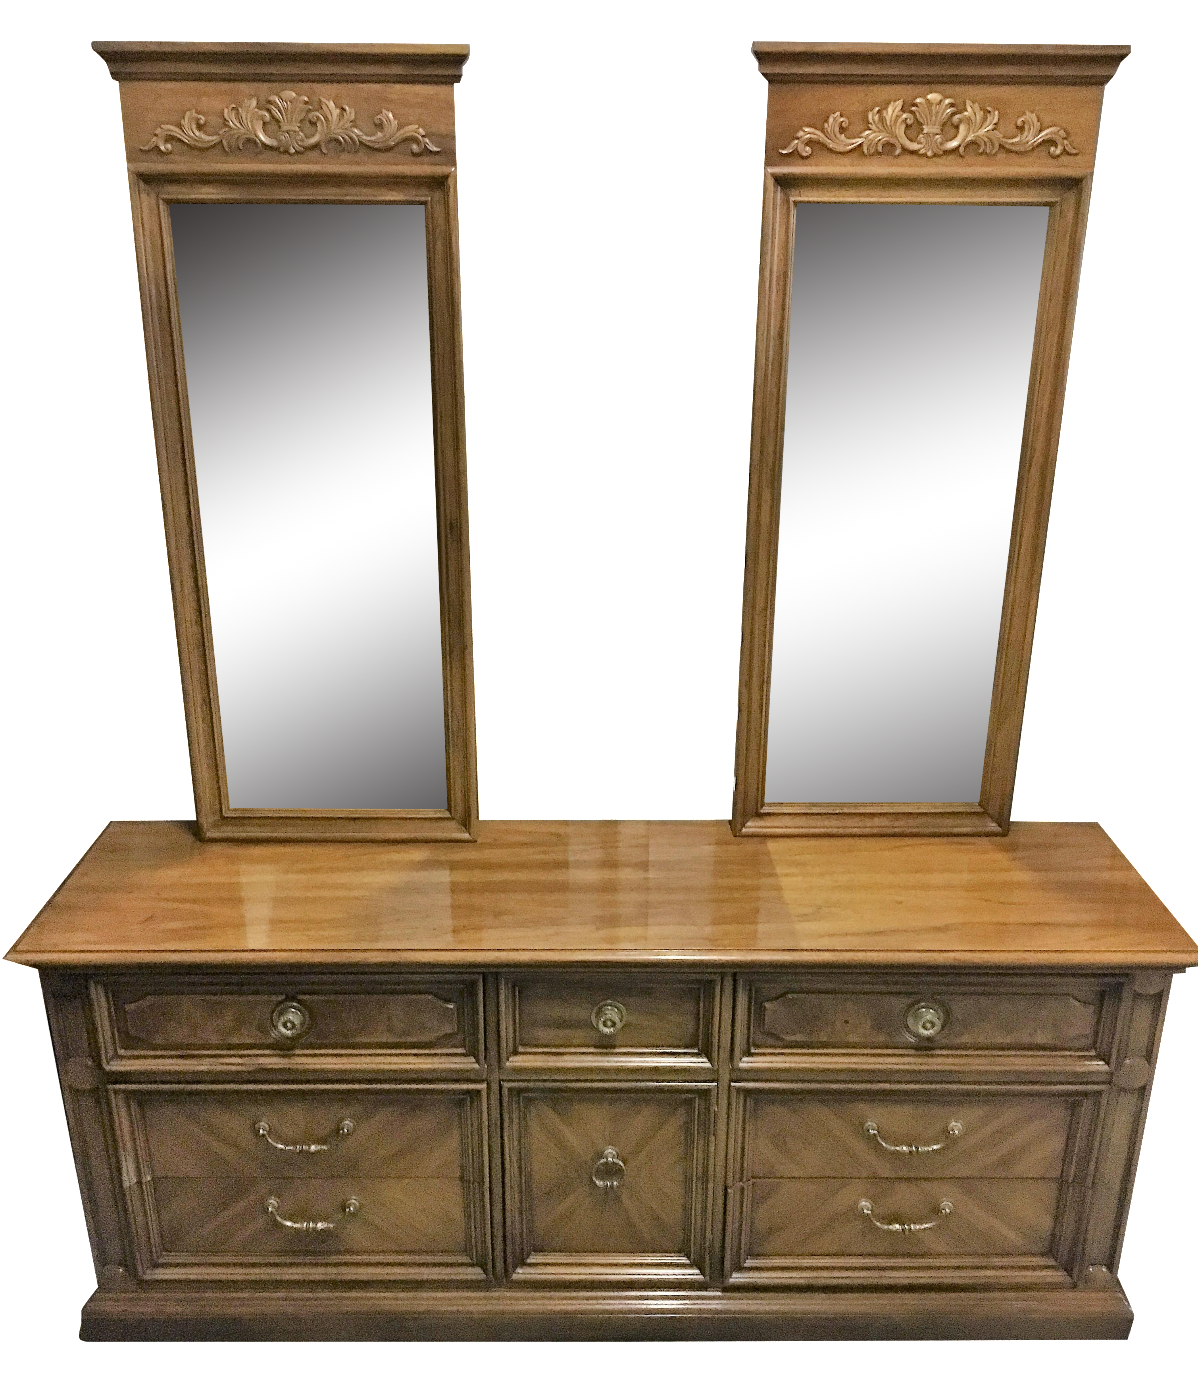 - Vintage Thomasville Dresser With Wall Mirrors Chairish